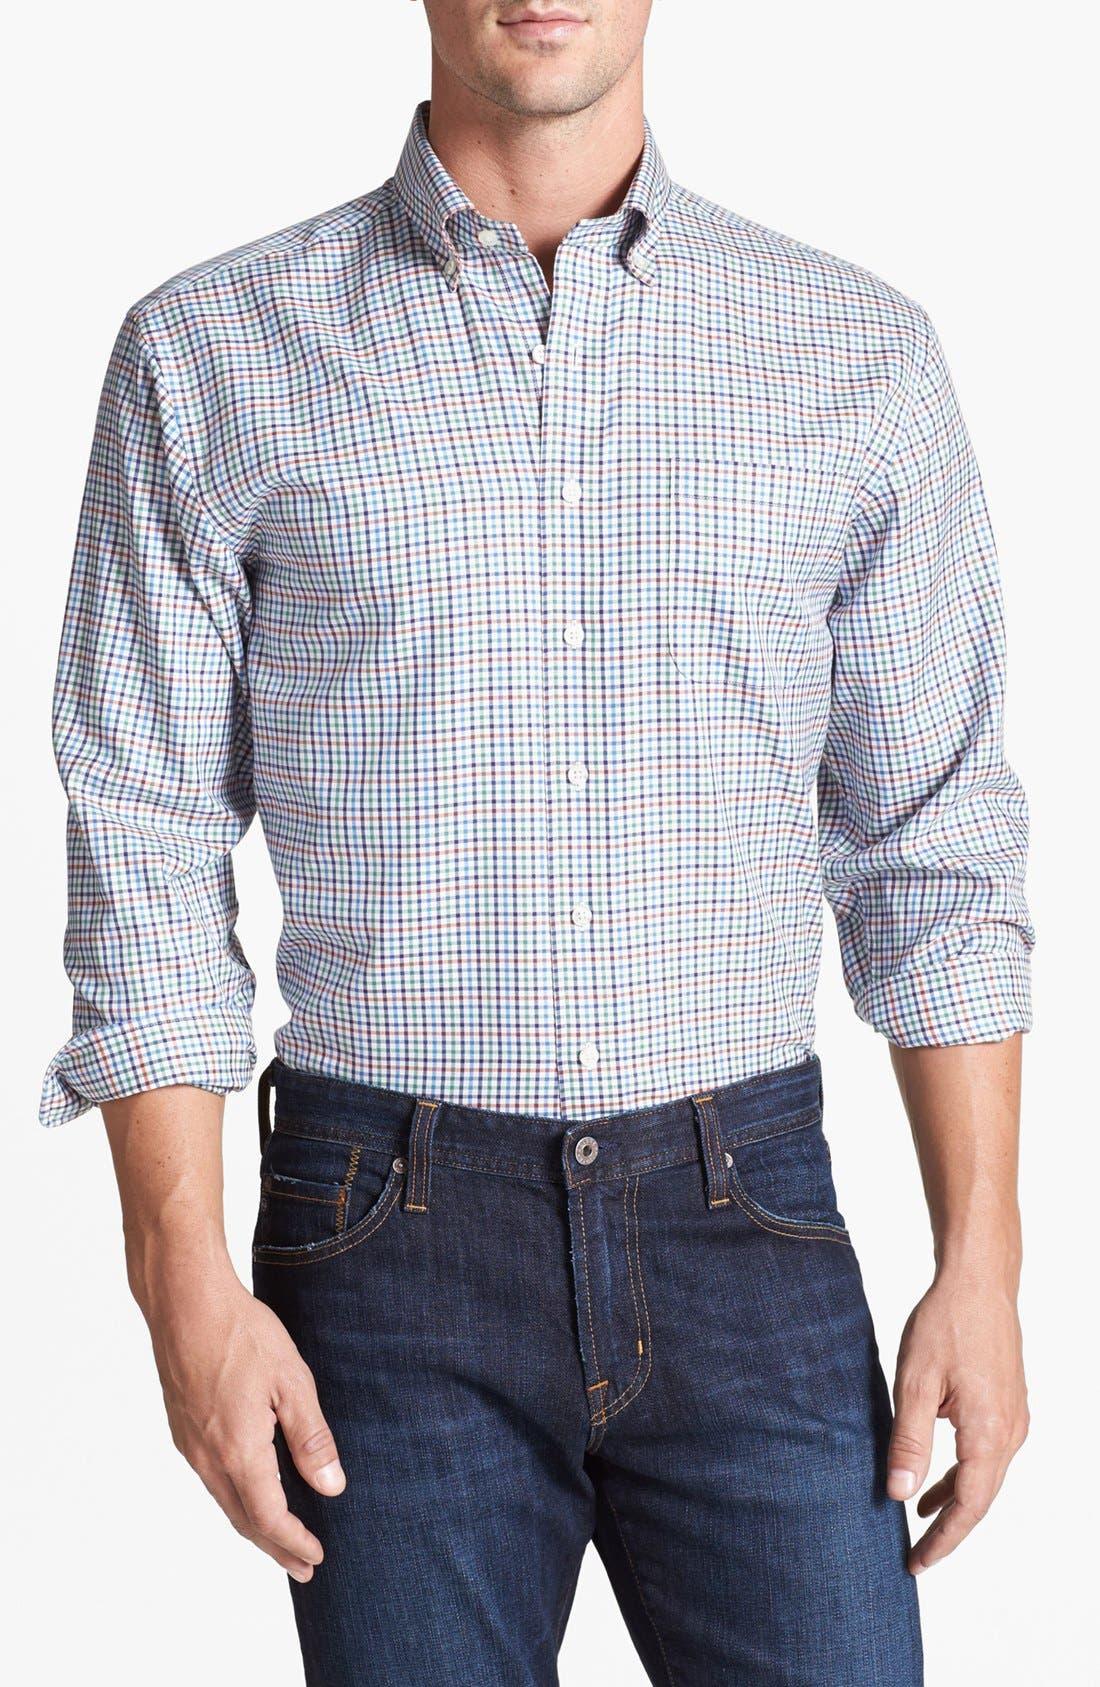 Main Image - Vineyard Vines 'Murray Sedgwick' Regular Fit Check Sport Shirt